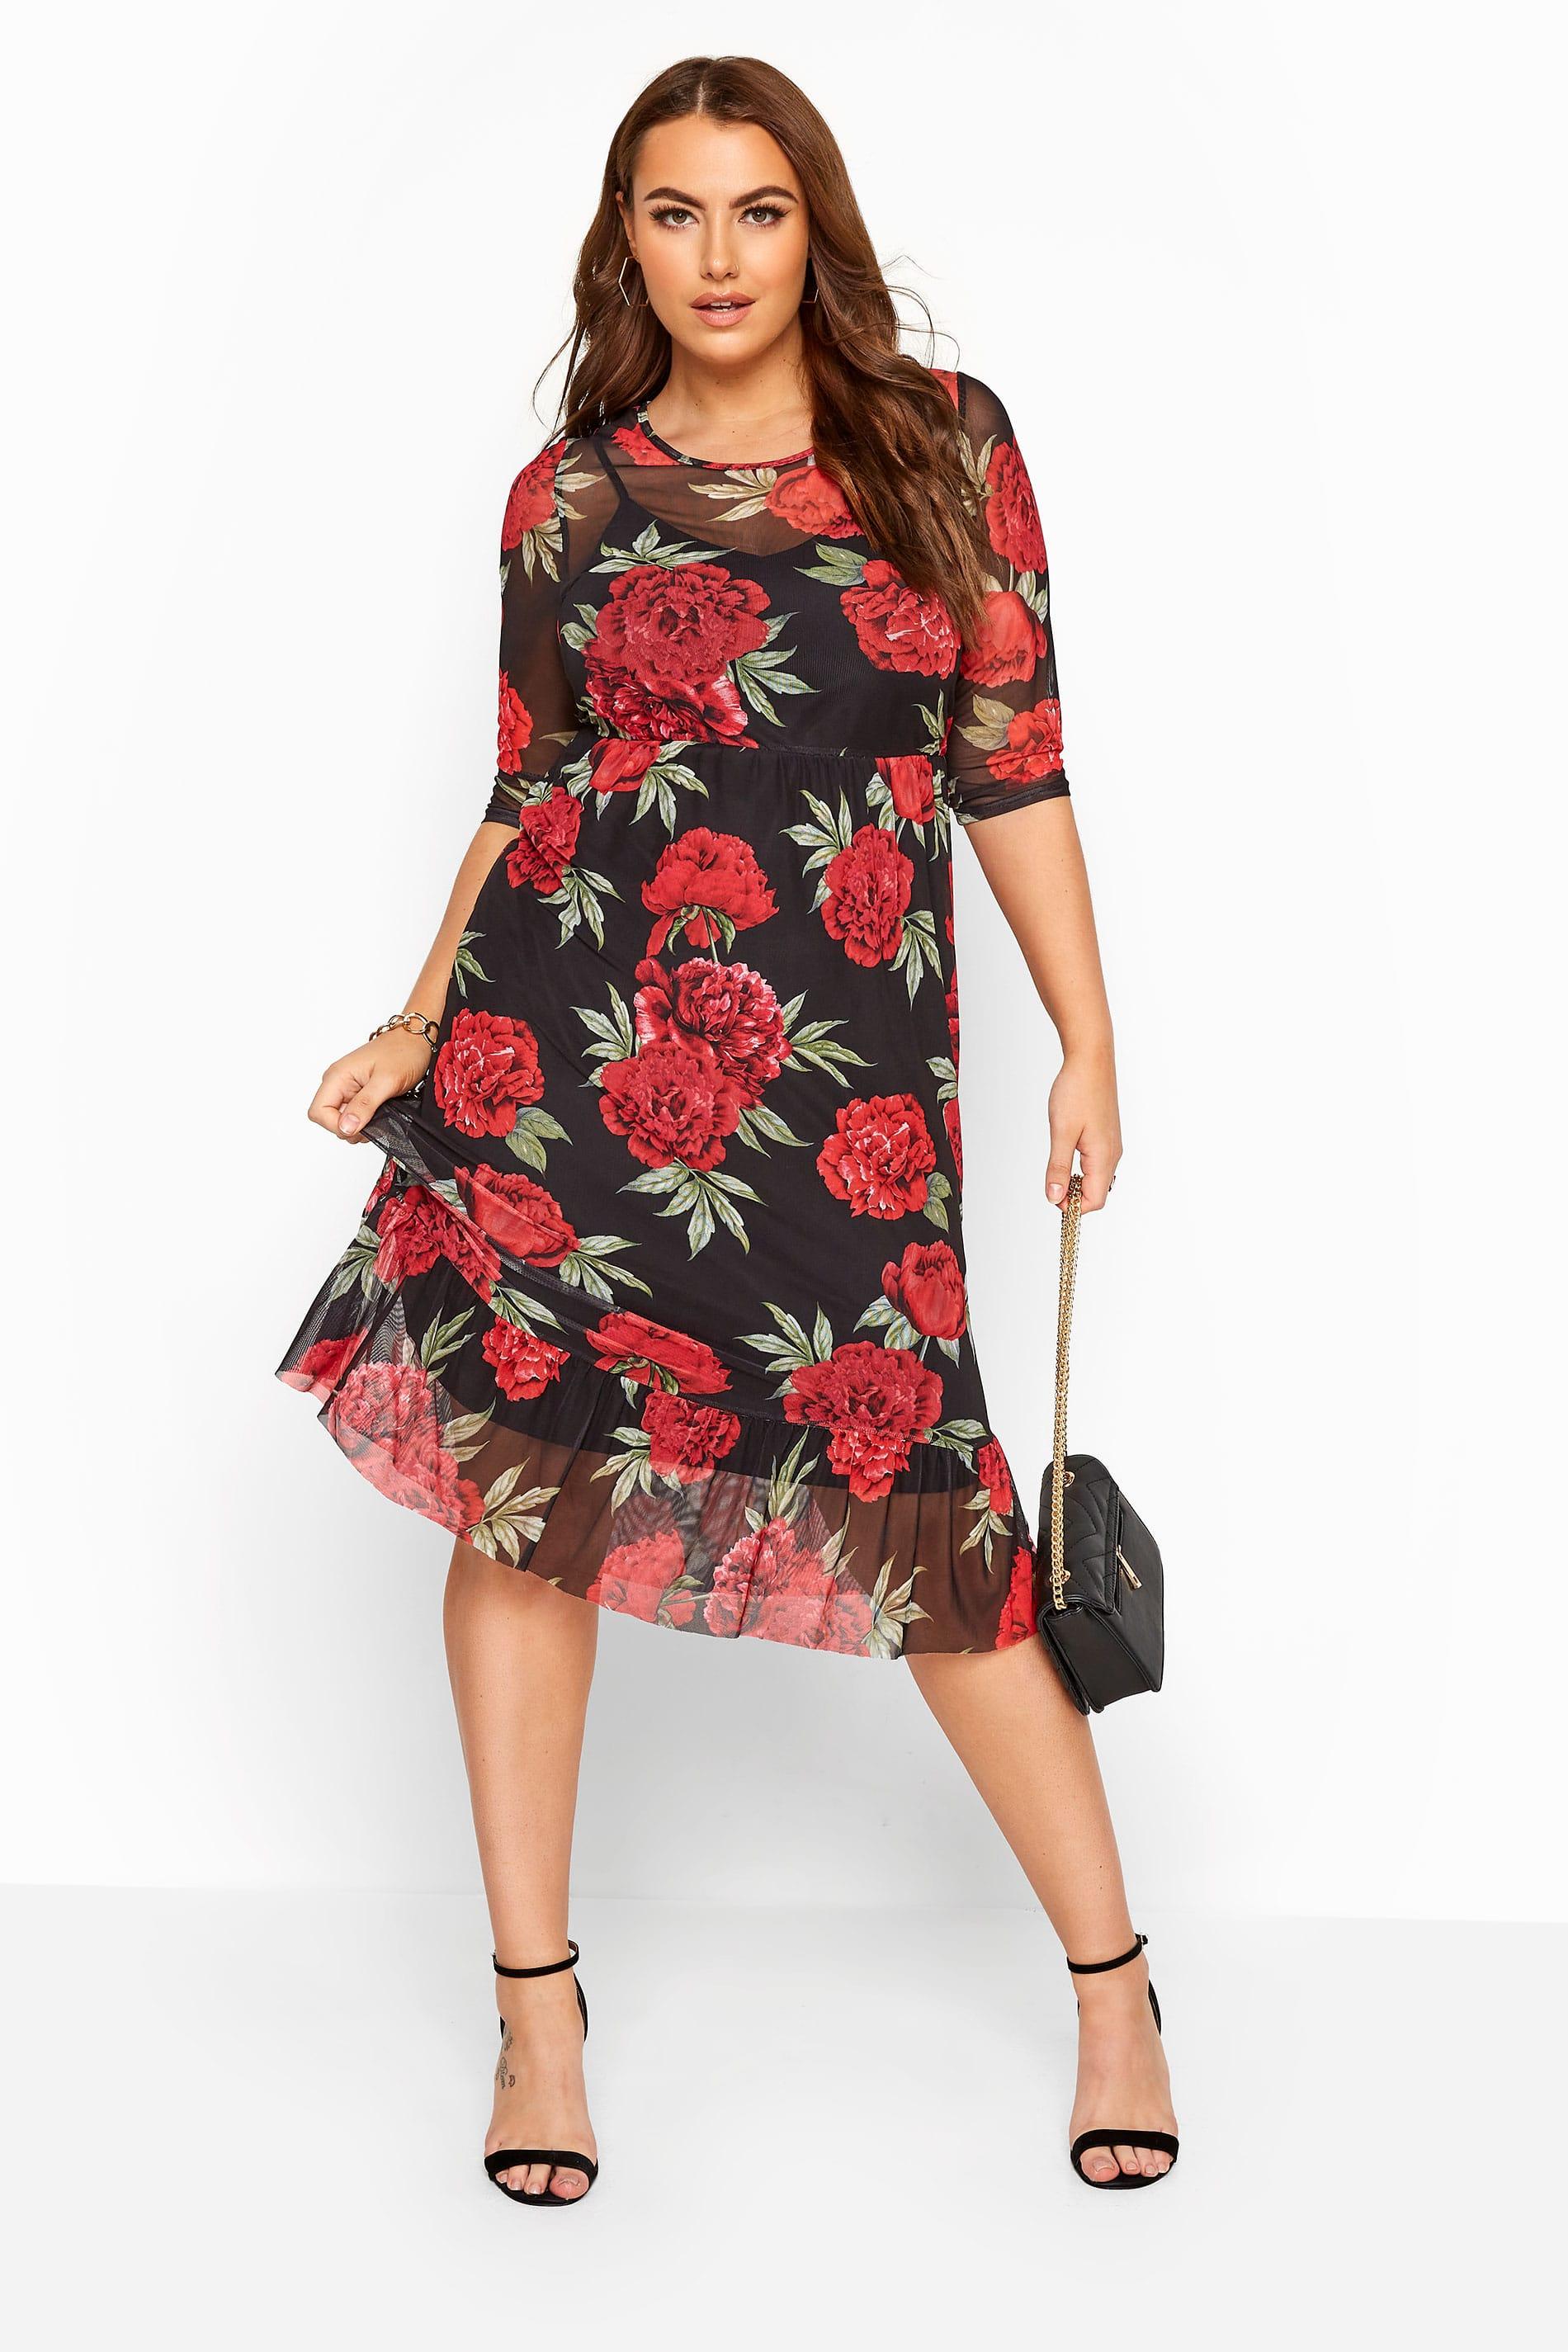 Black & Red Mesh Floral Ruffle Dress